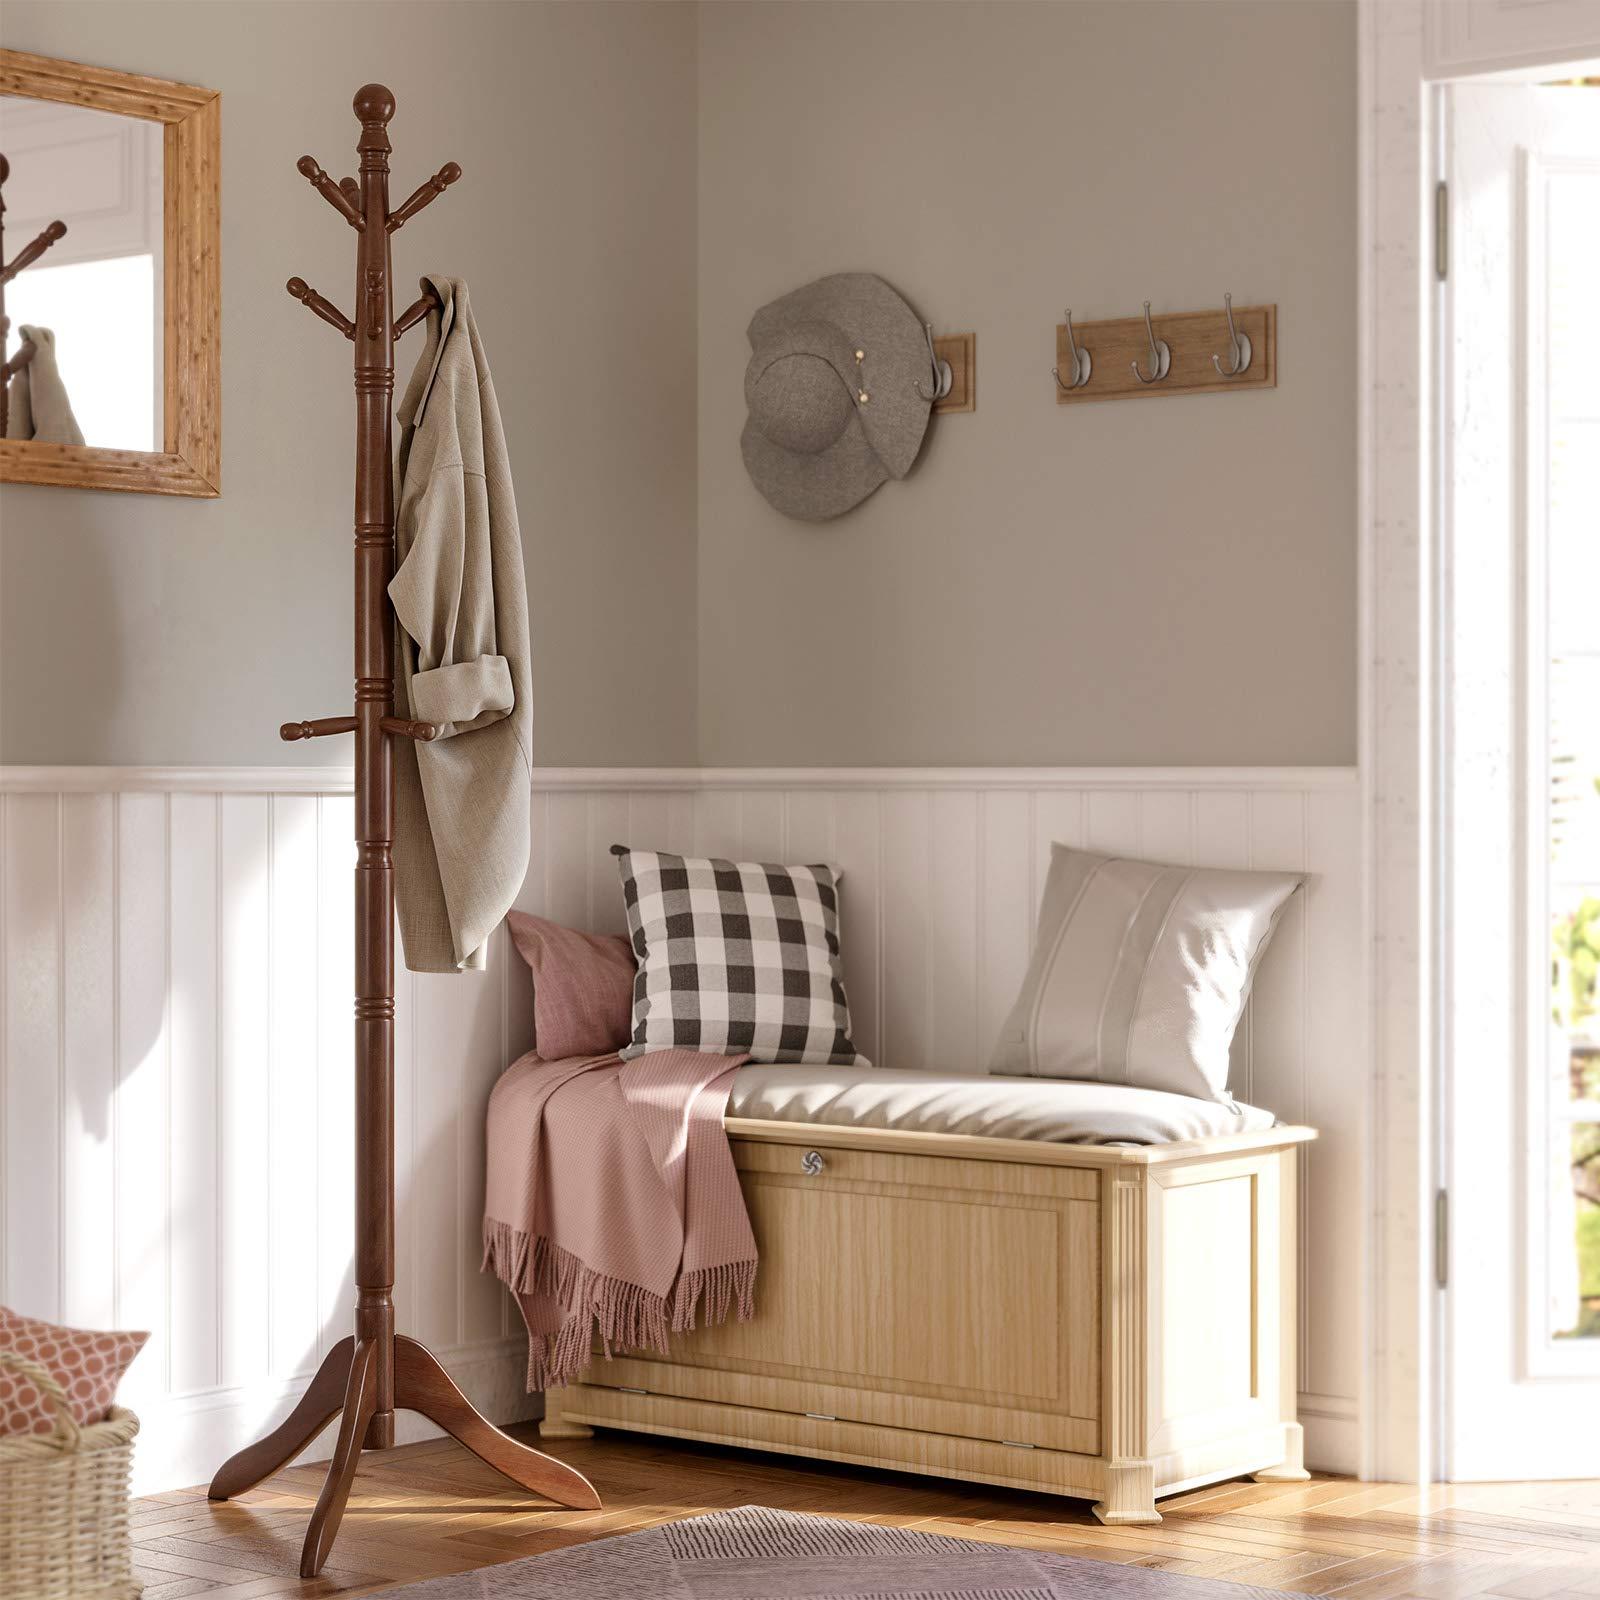 Coat Rack, Solid Wood Coat Stand